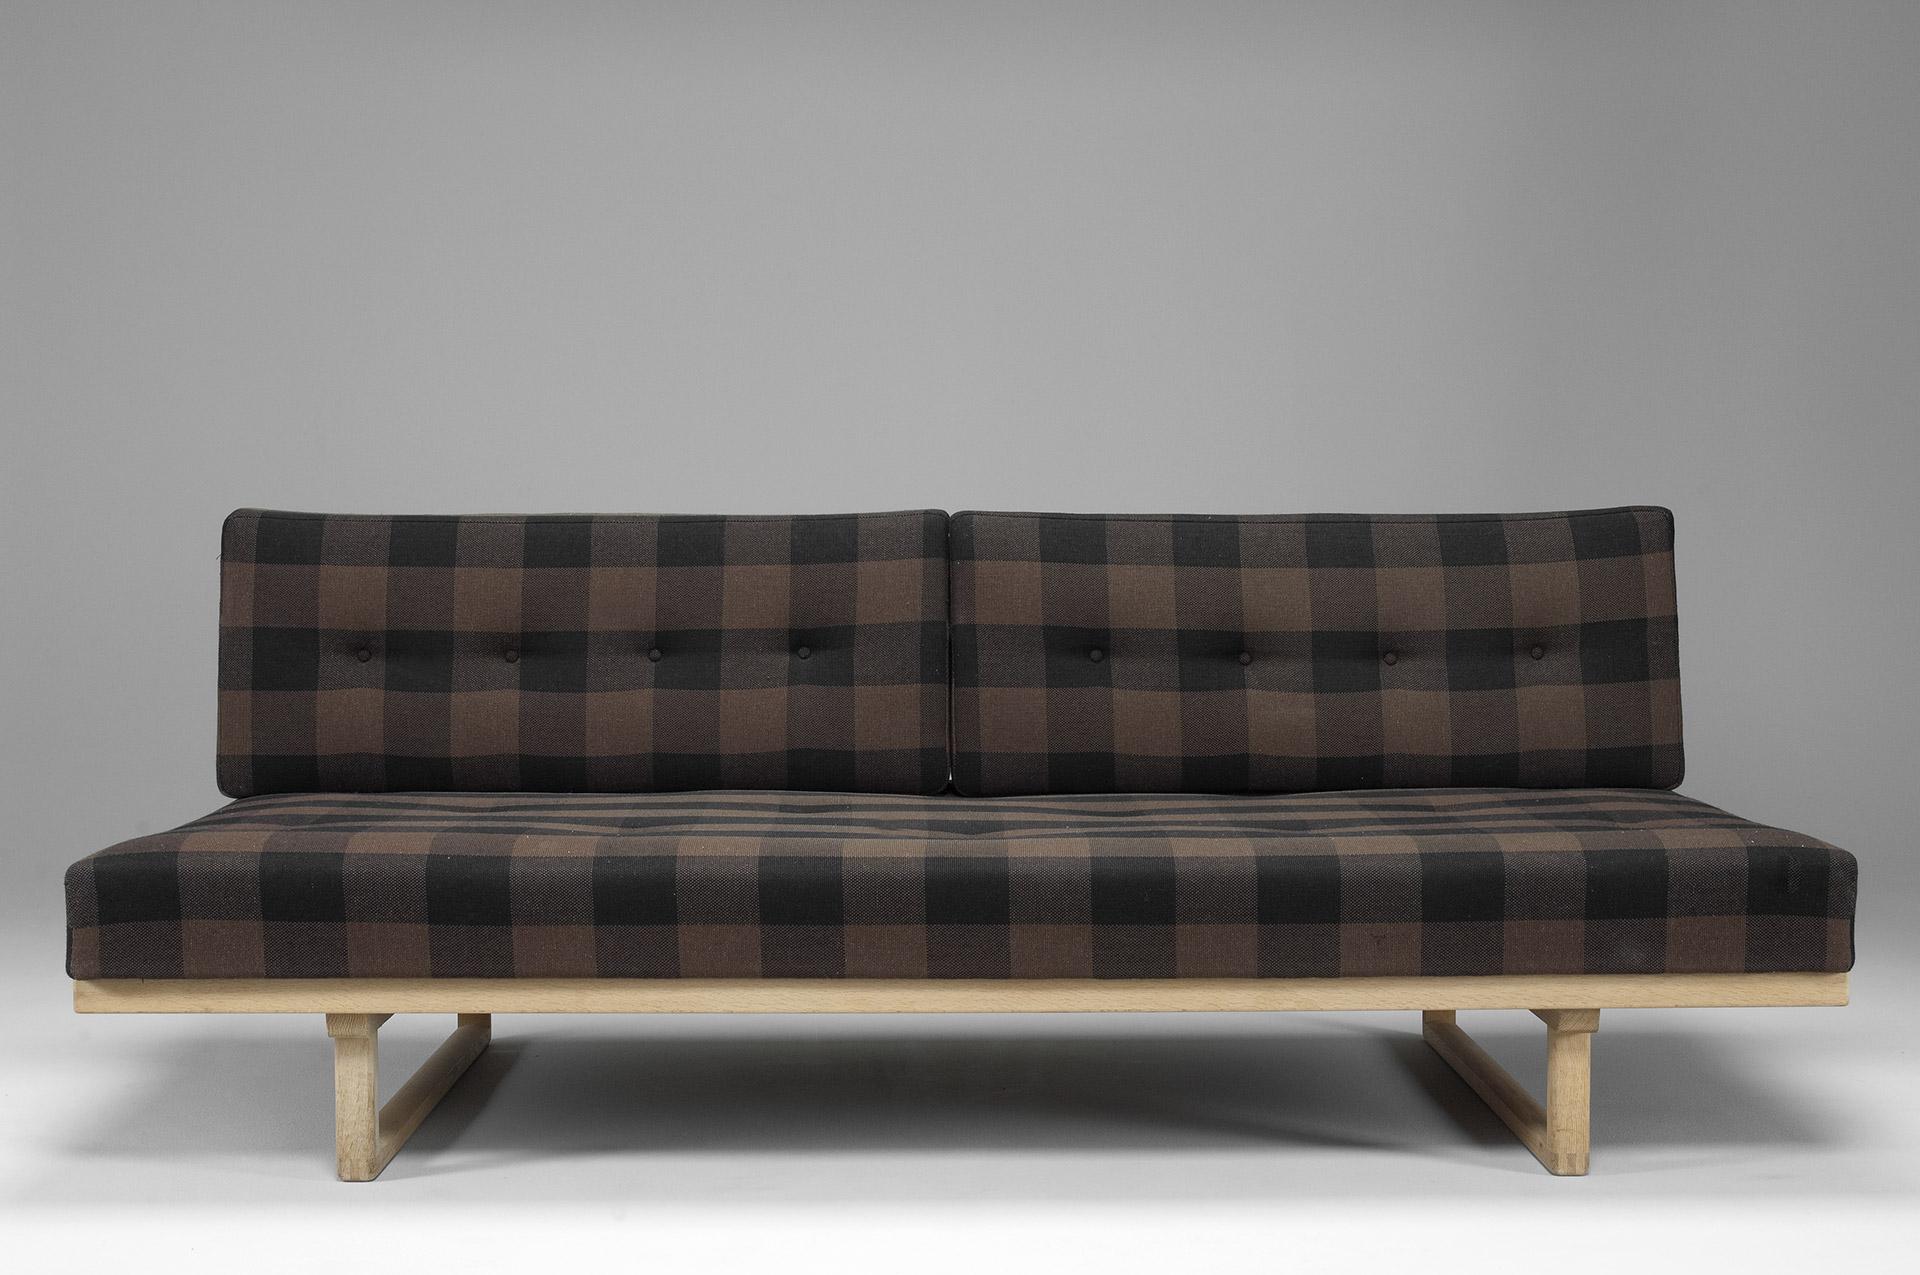 Jacksons Sofa Daybed B¸rge Mogensen